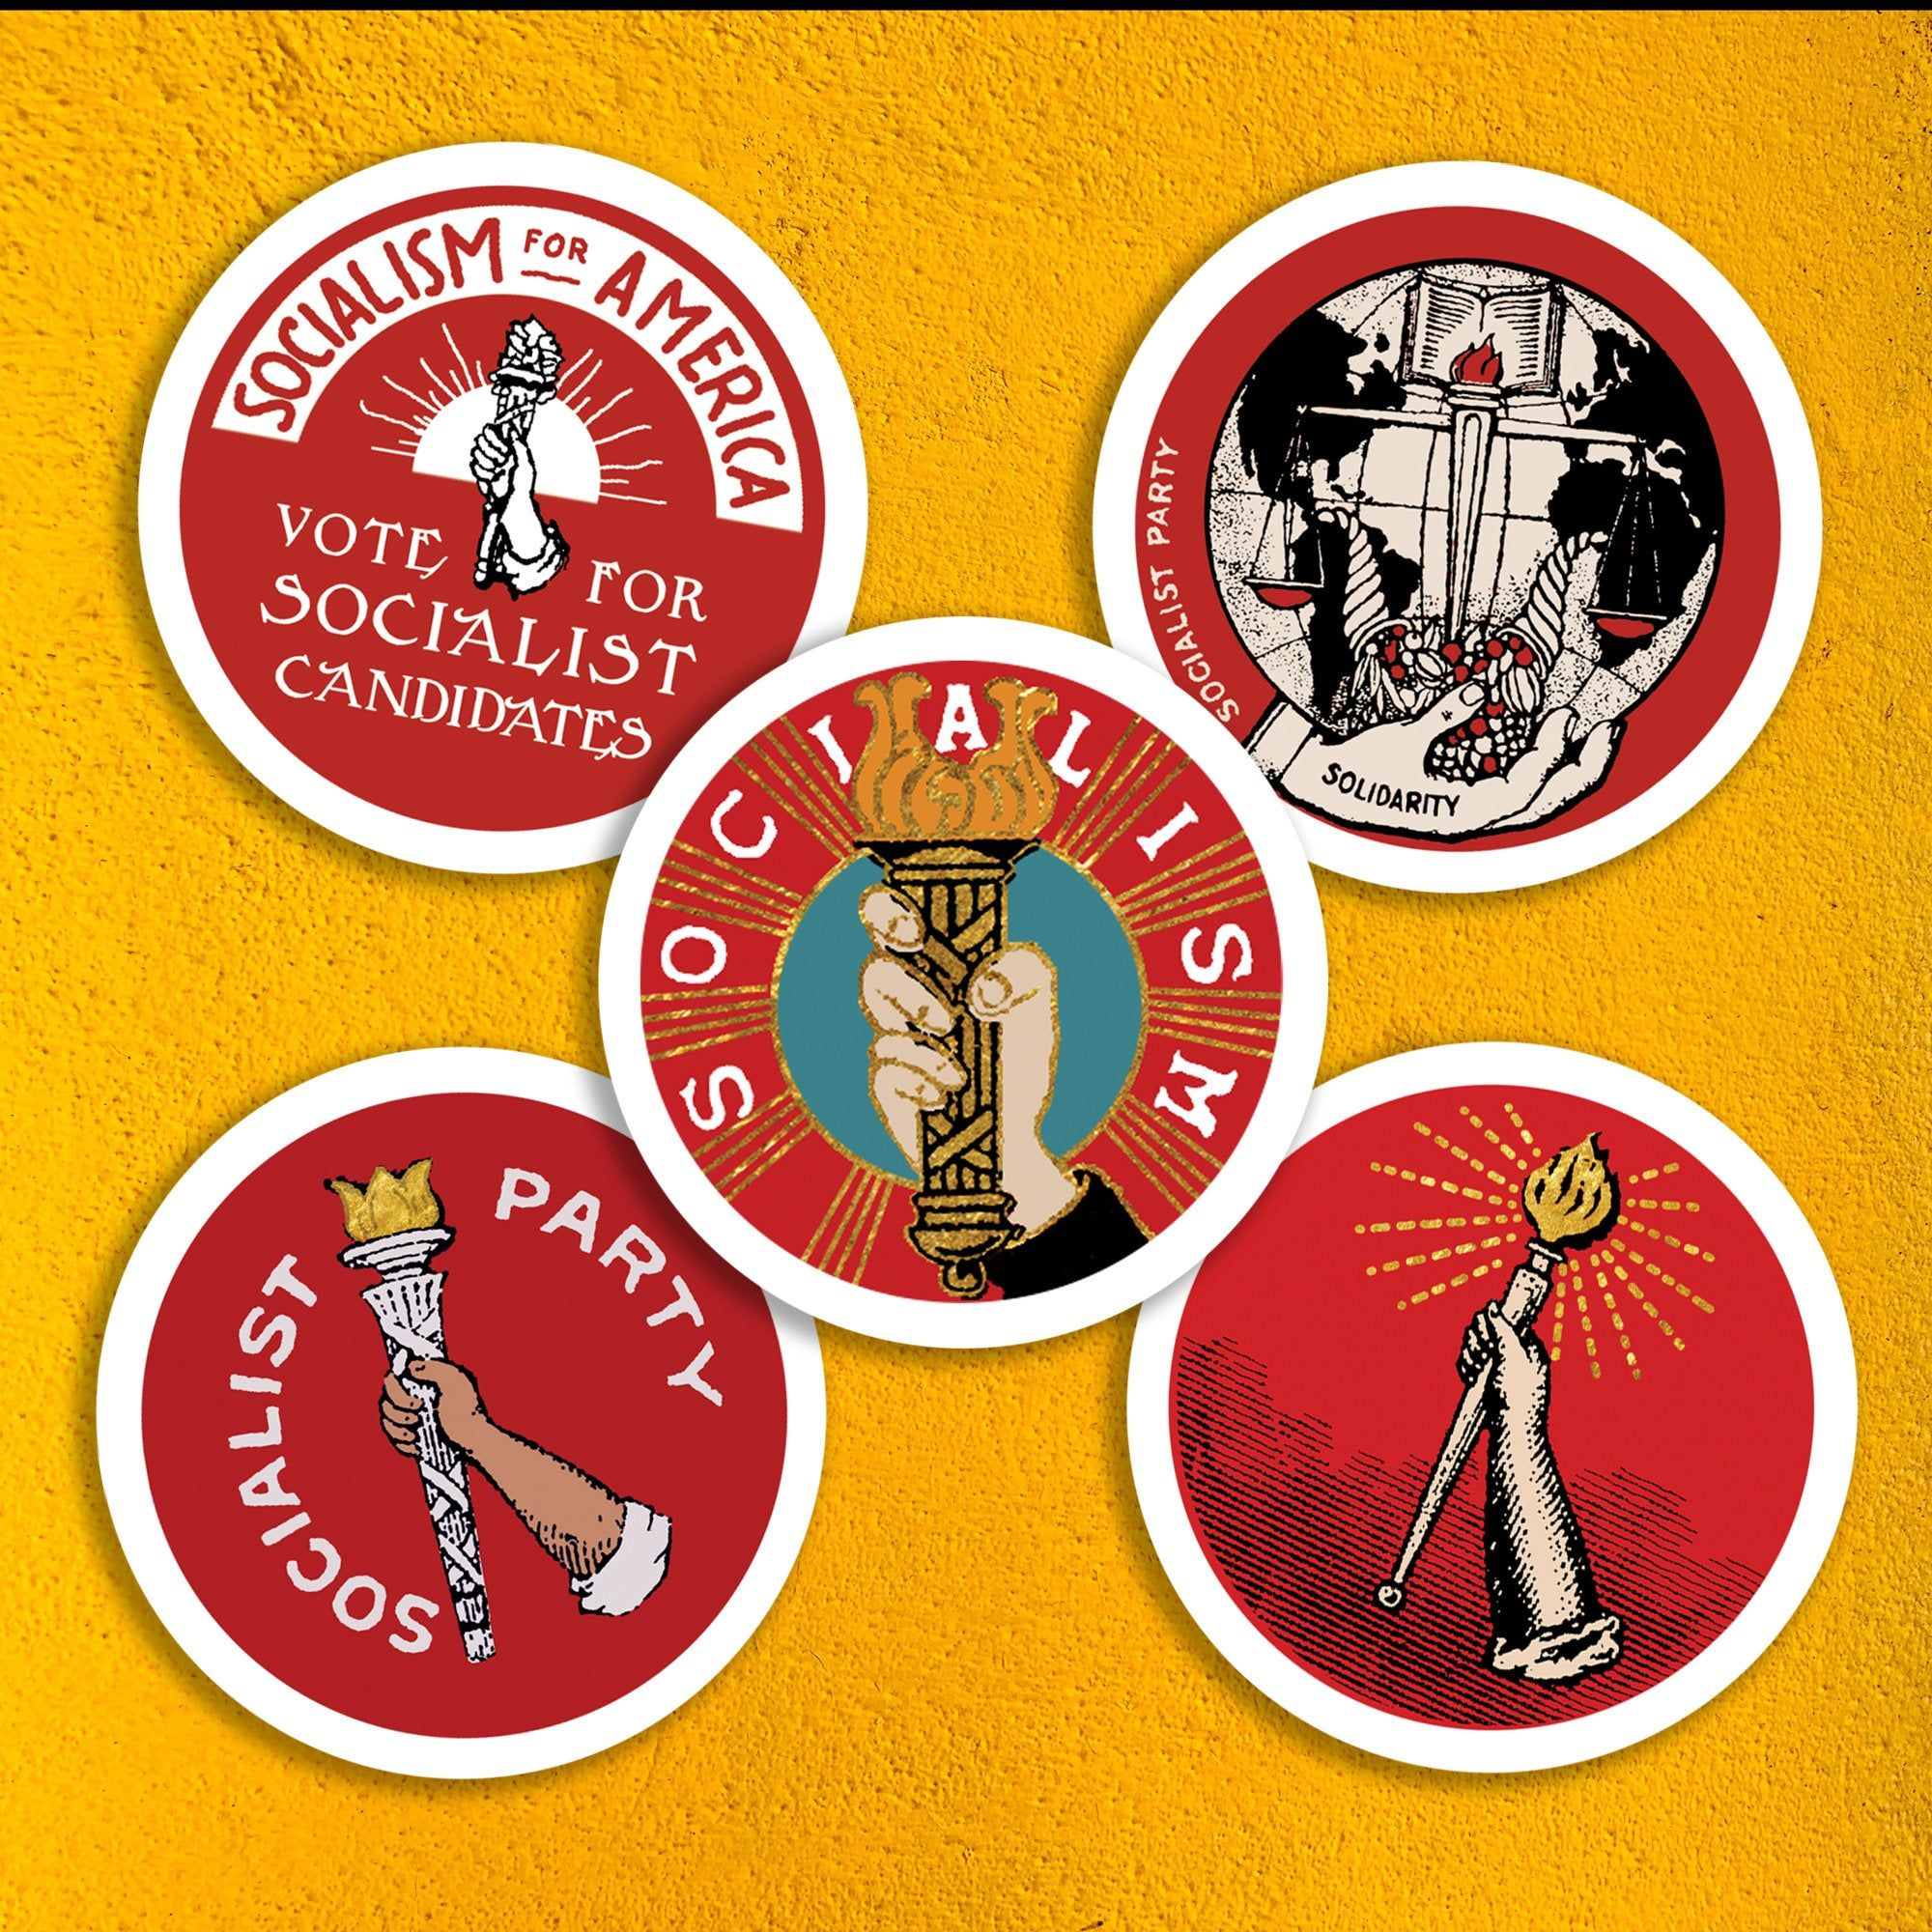 Socialist Torch Sticker Set Retro Socialism Party Solidarity Socialism For America Leftist Vinyl Stickers Small Gift Sticker Set Vinyl Sticker Poster Stickers